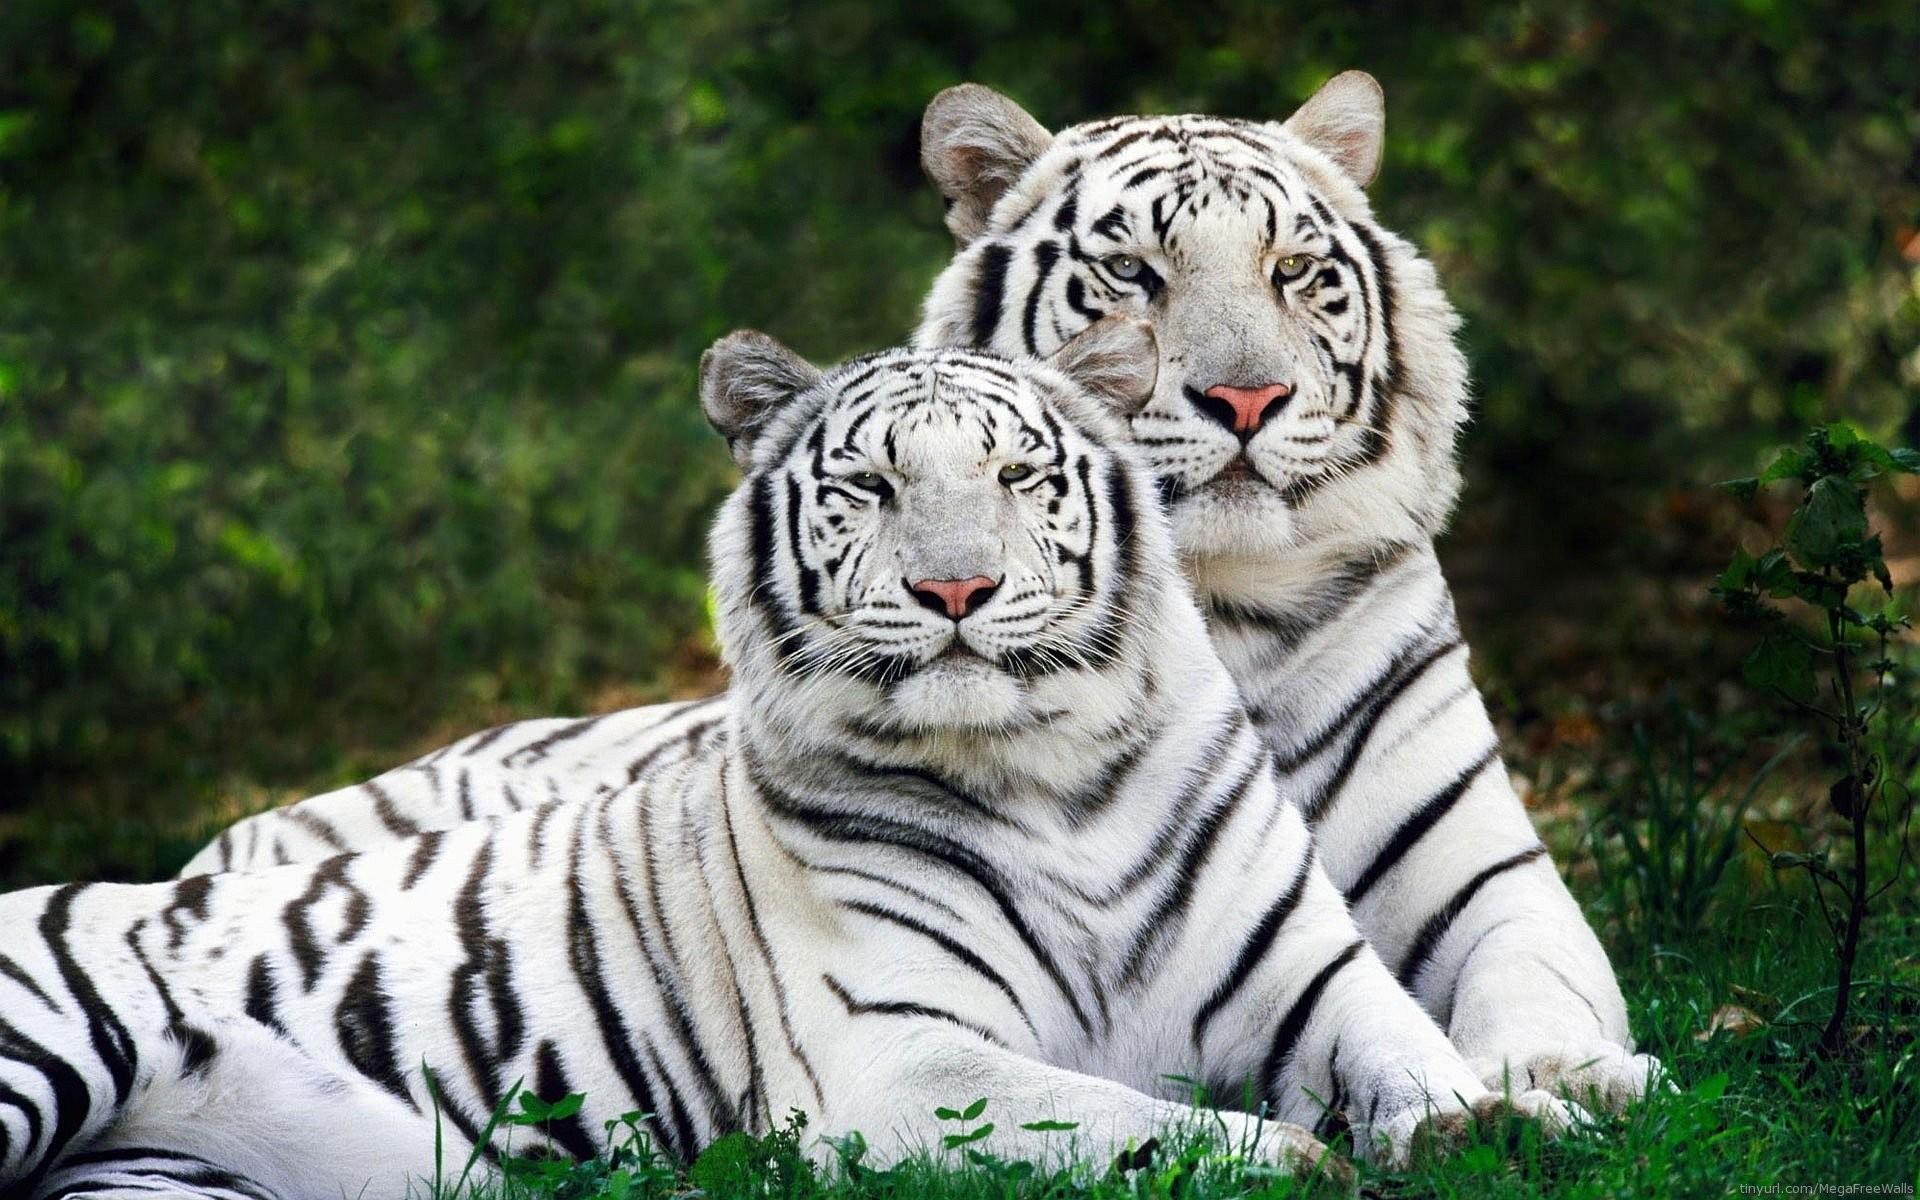 Hintergrundbilder hd tiger